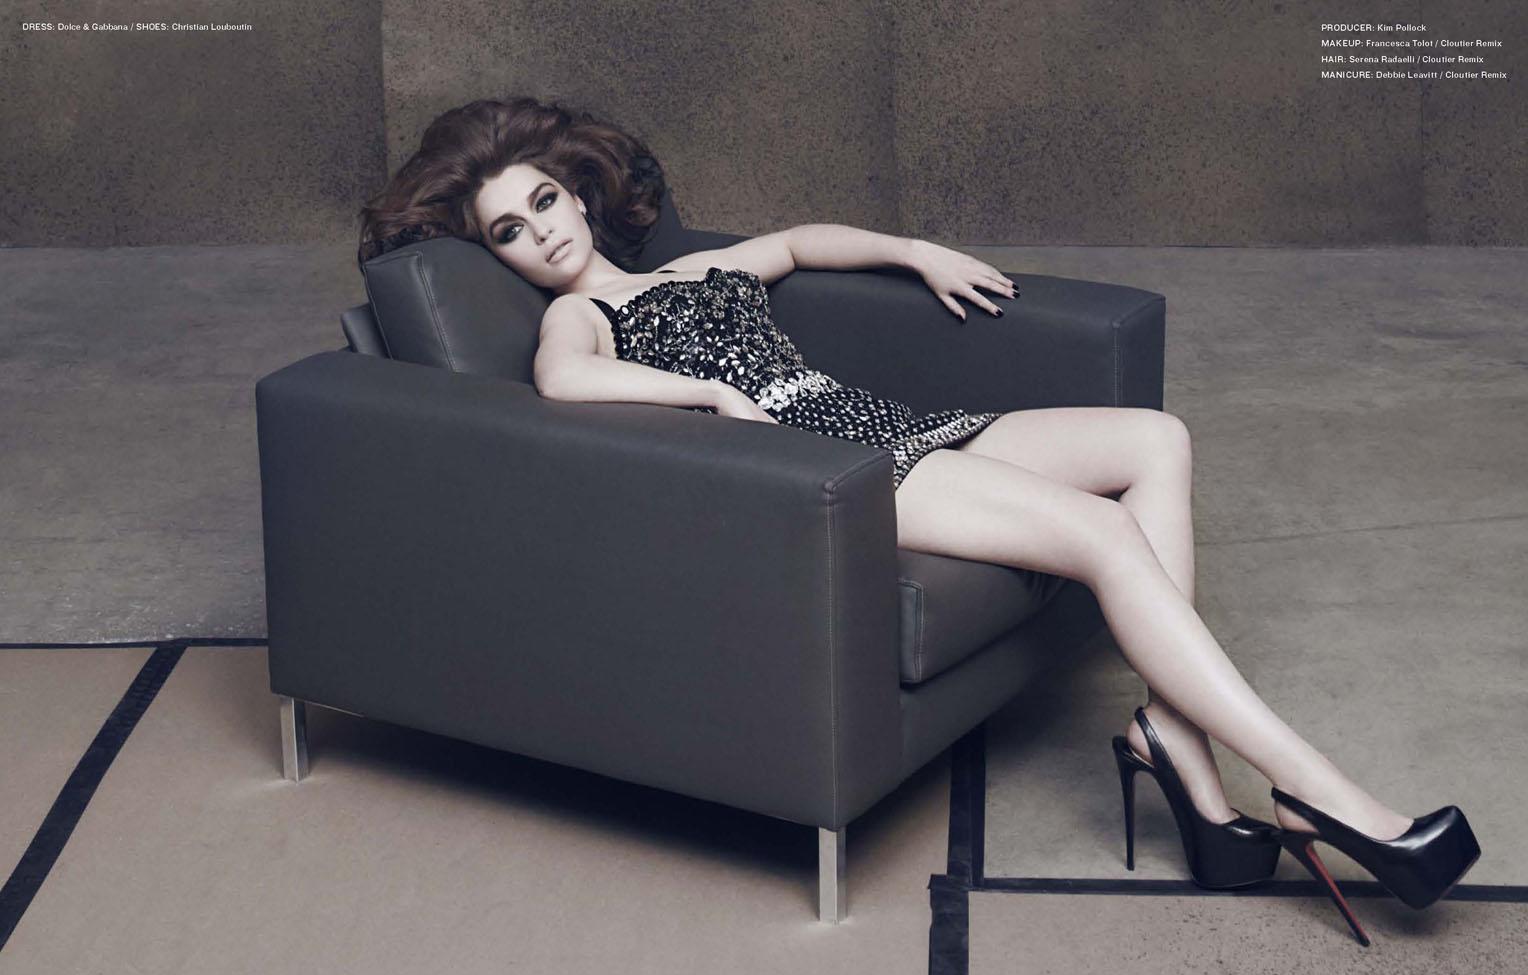 LATM- Emilia Clarke - Ph Ruven Afanfor (5)web